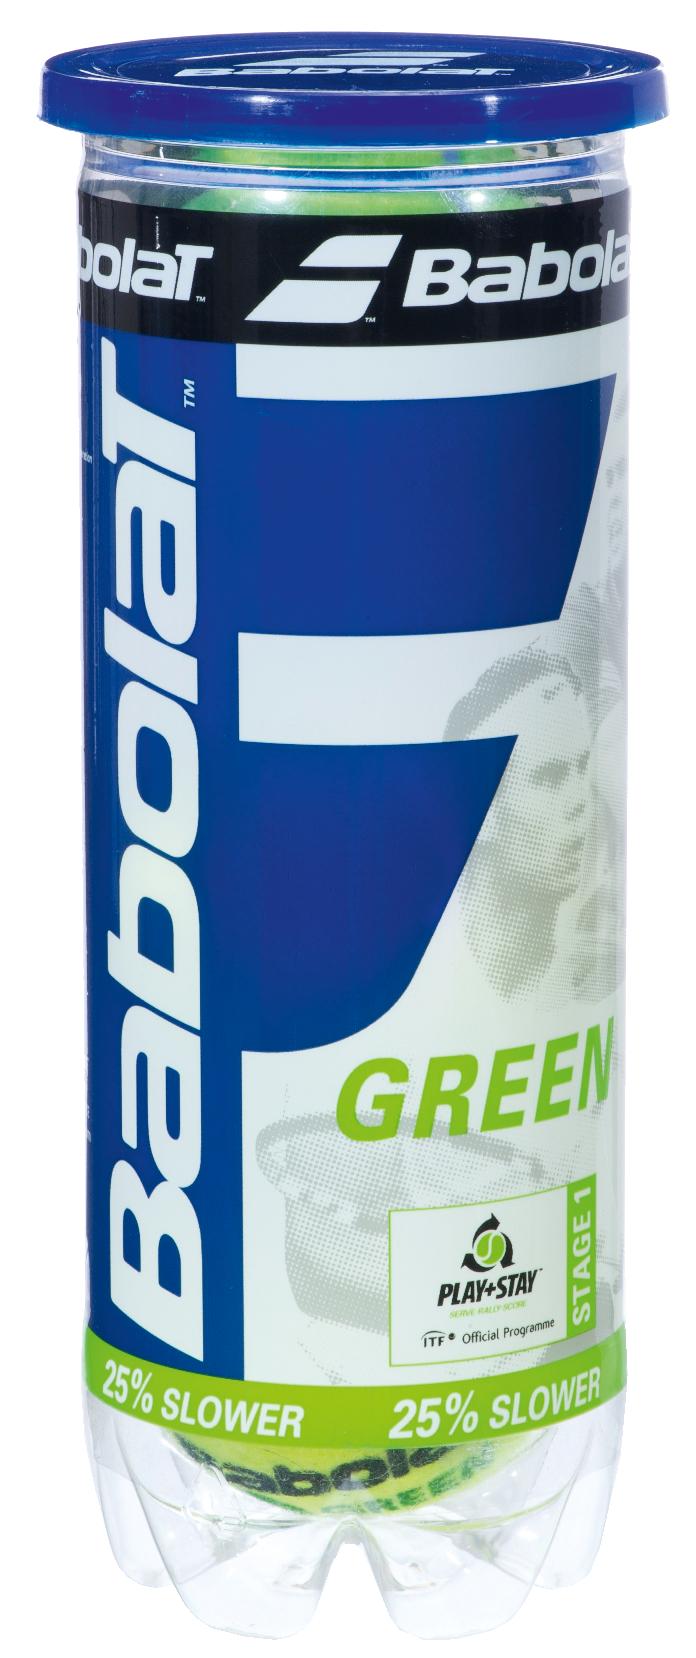 Groen (3 ballen/tube)